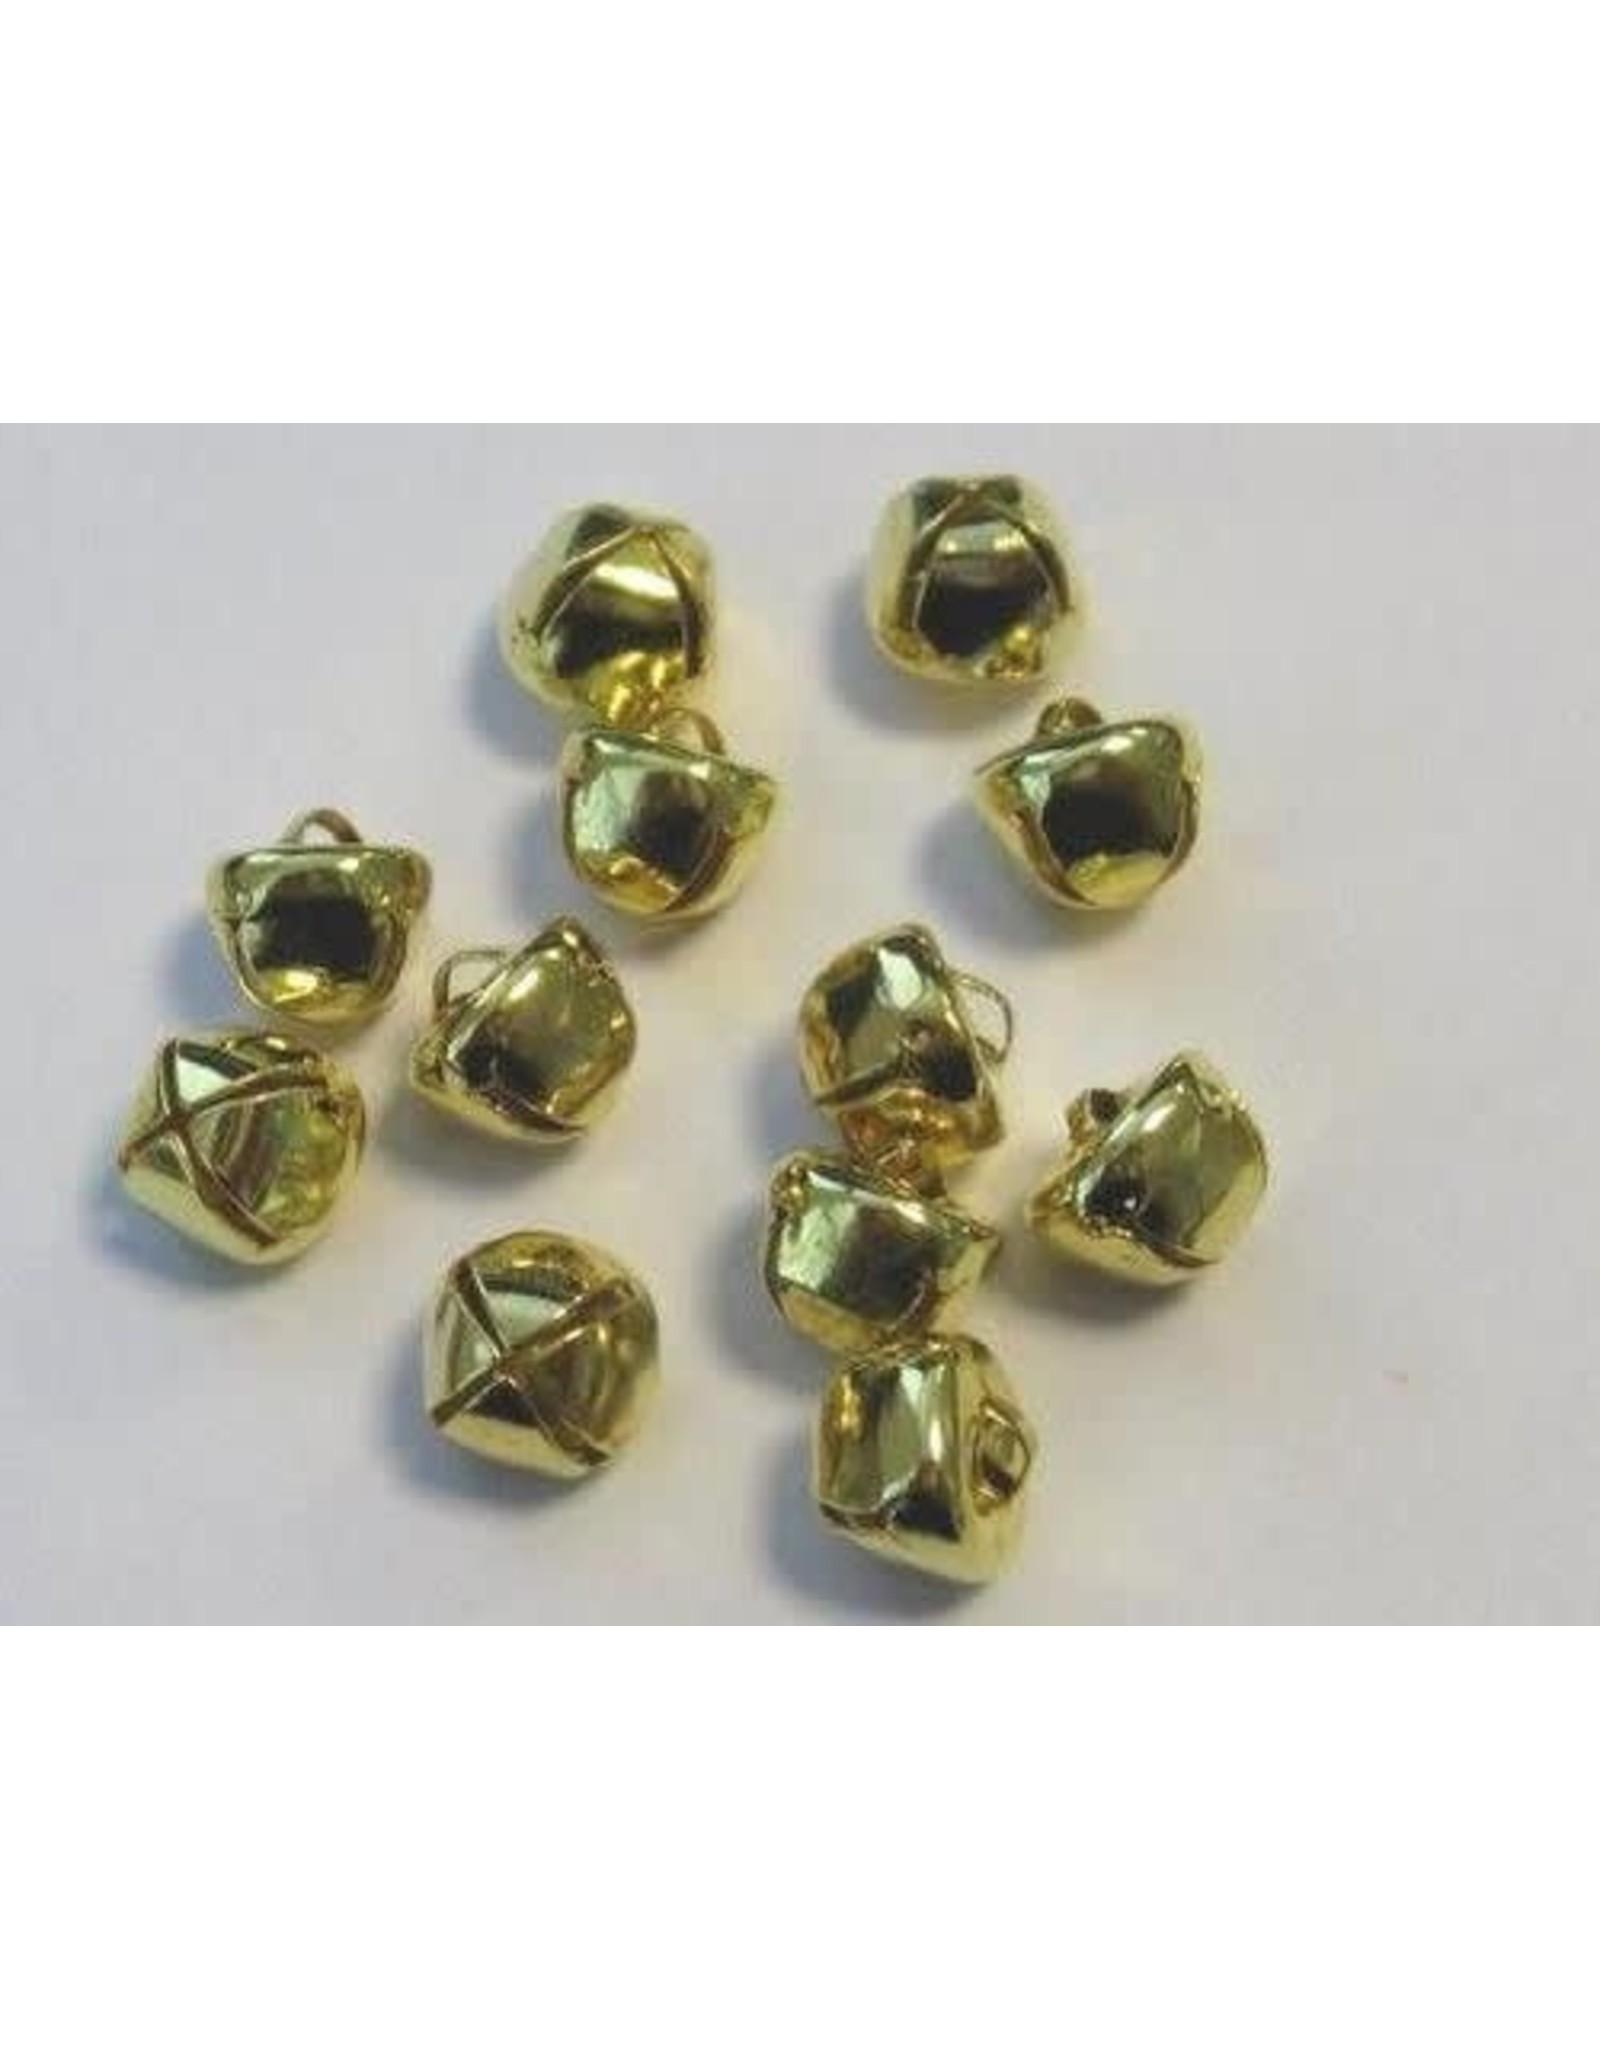 hobby crafting fun Kerst belletjes goudkleur 10 mm 12 ST (1 PK) 12239-3912